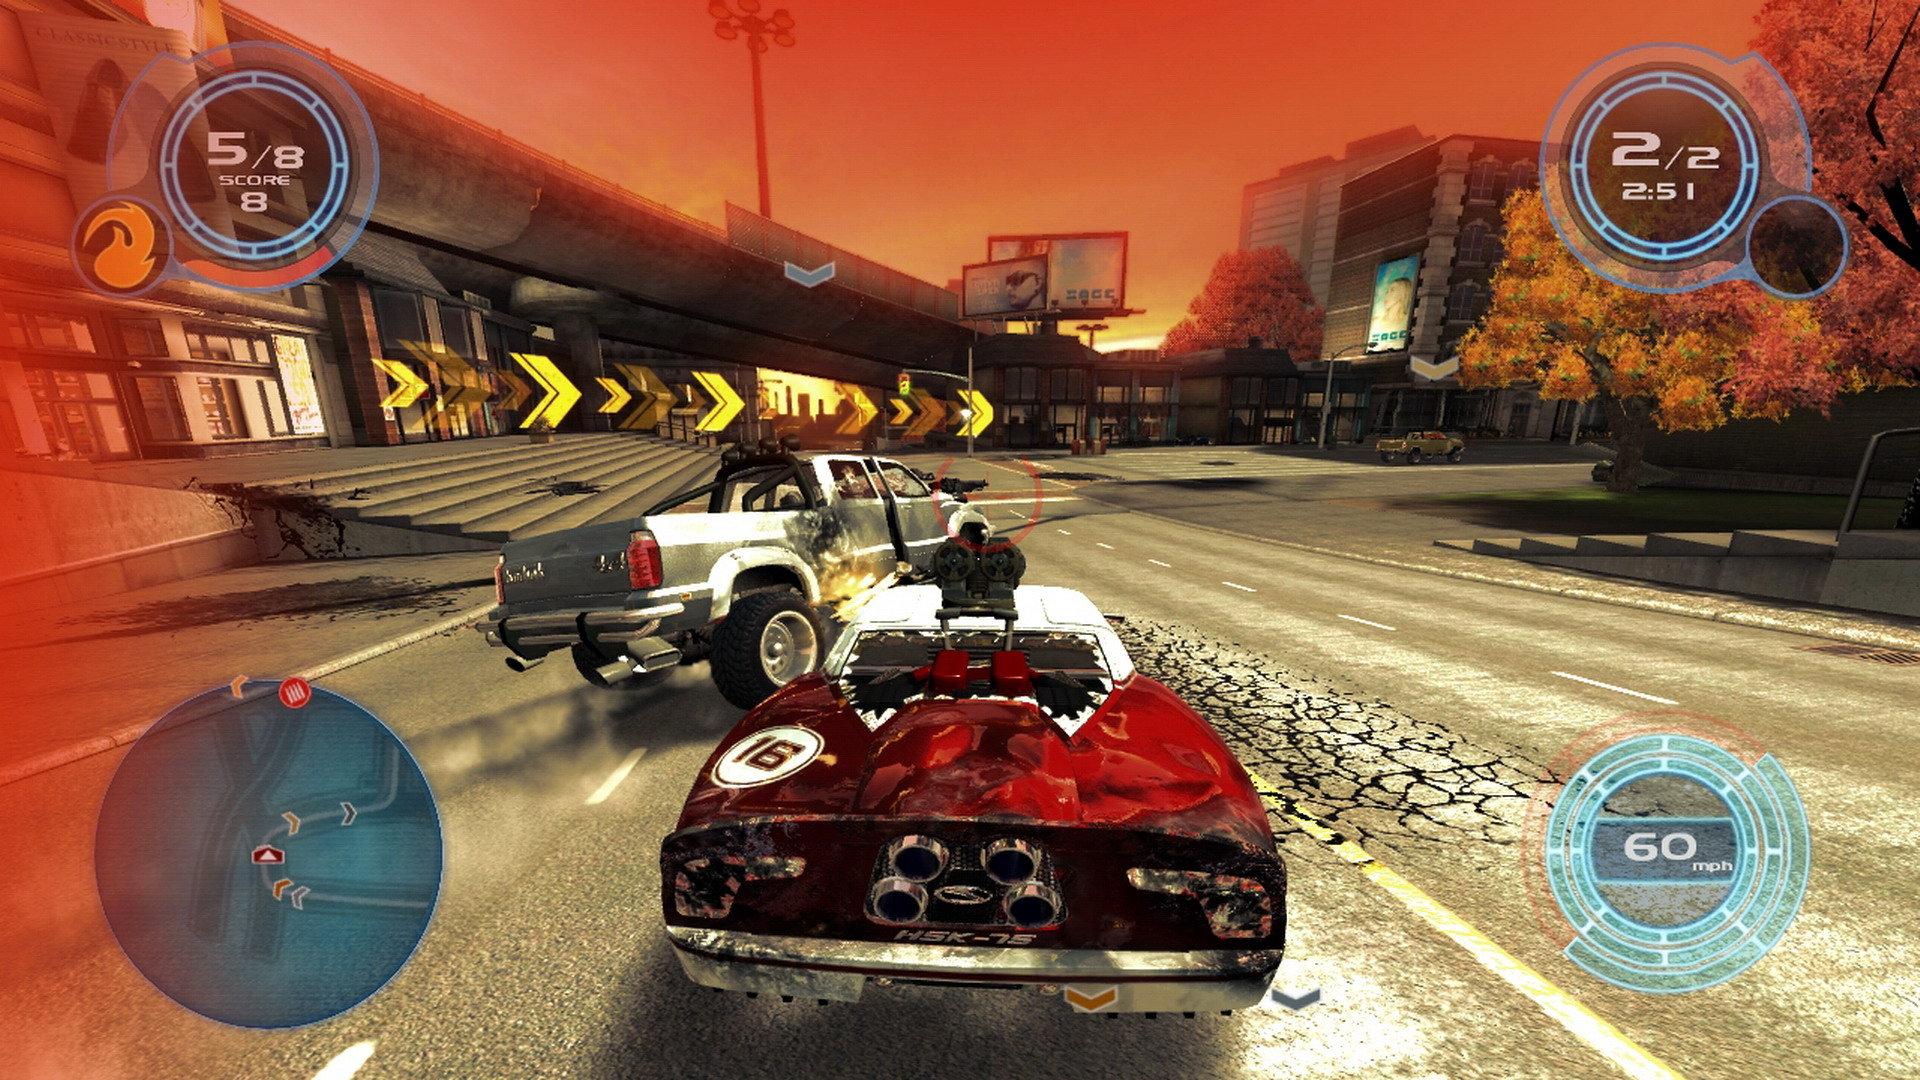 Full Auto 2 Battlelines PS3 1080p